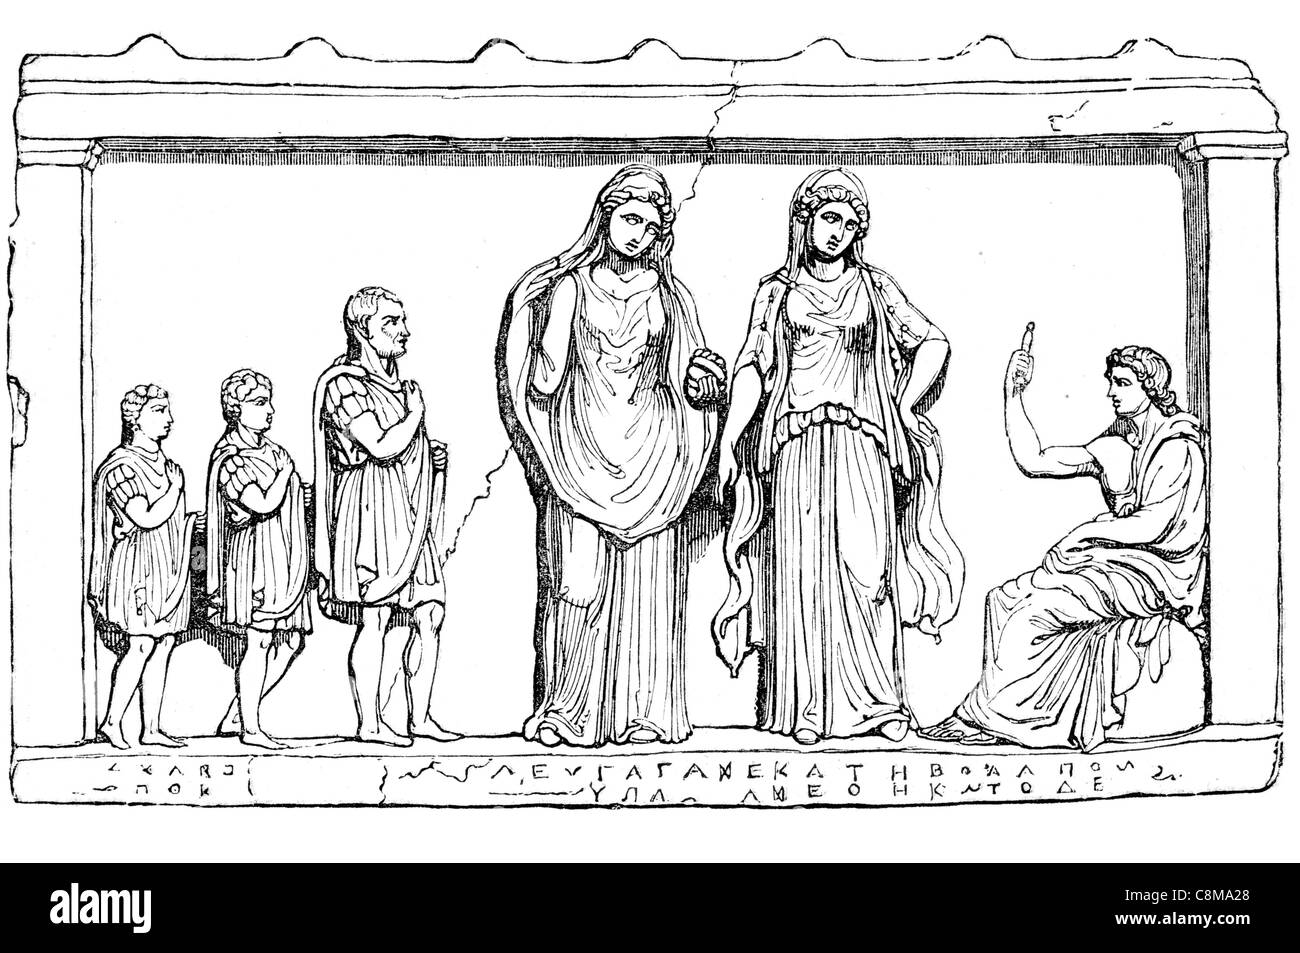 consultation of the oracle of Apollo deity ancient Greek myth mythology son Zeus Leto Artemis - Stock Image